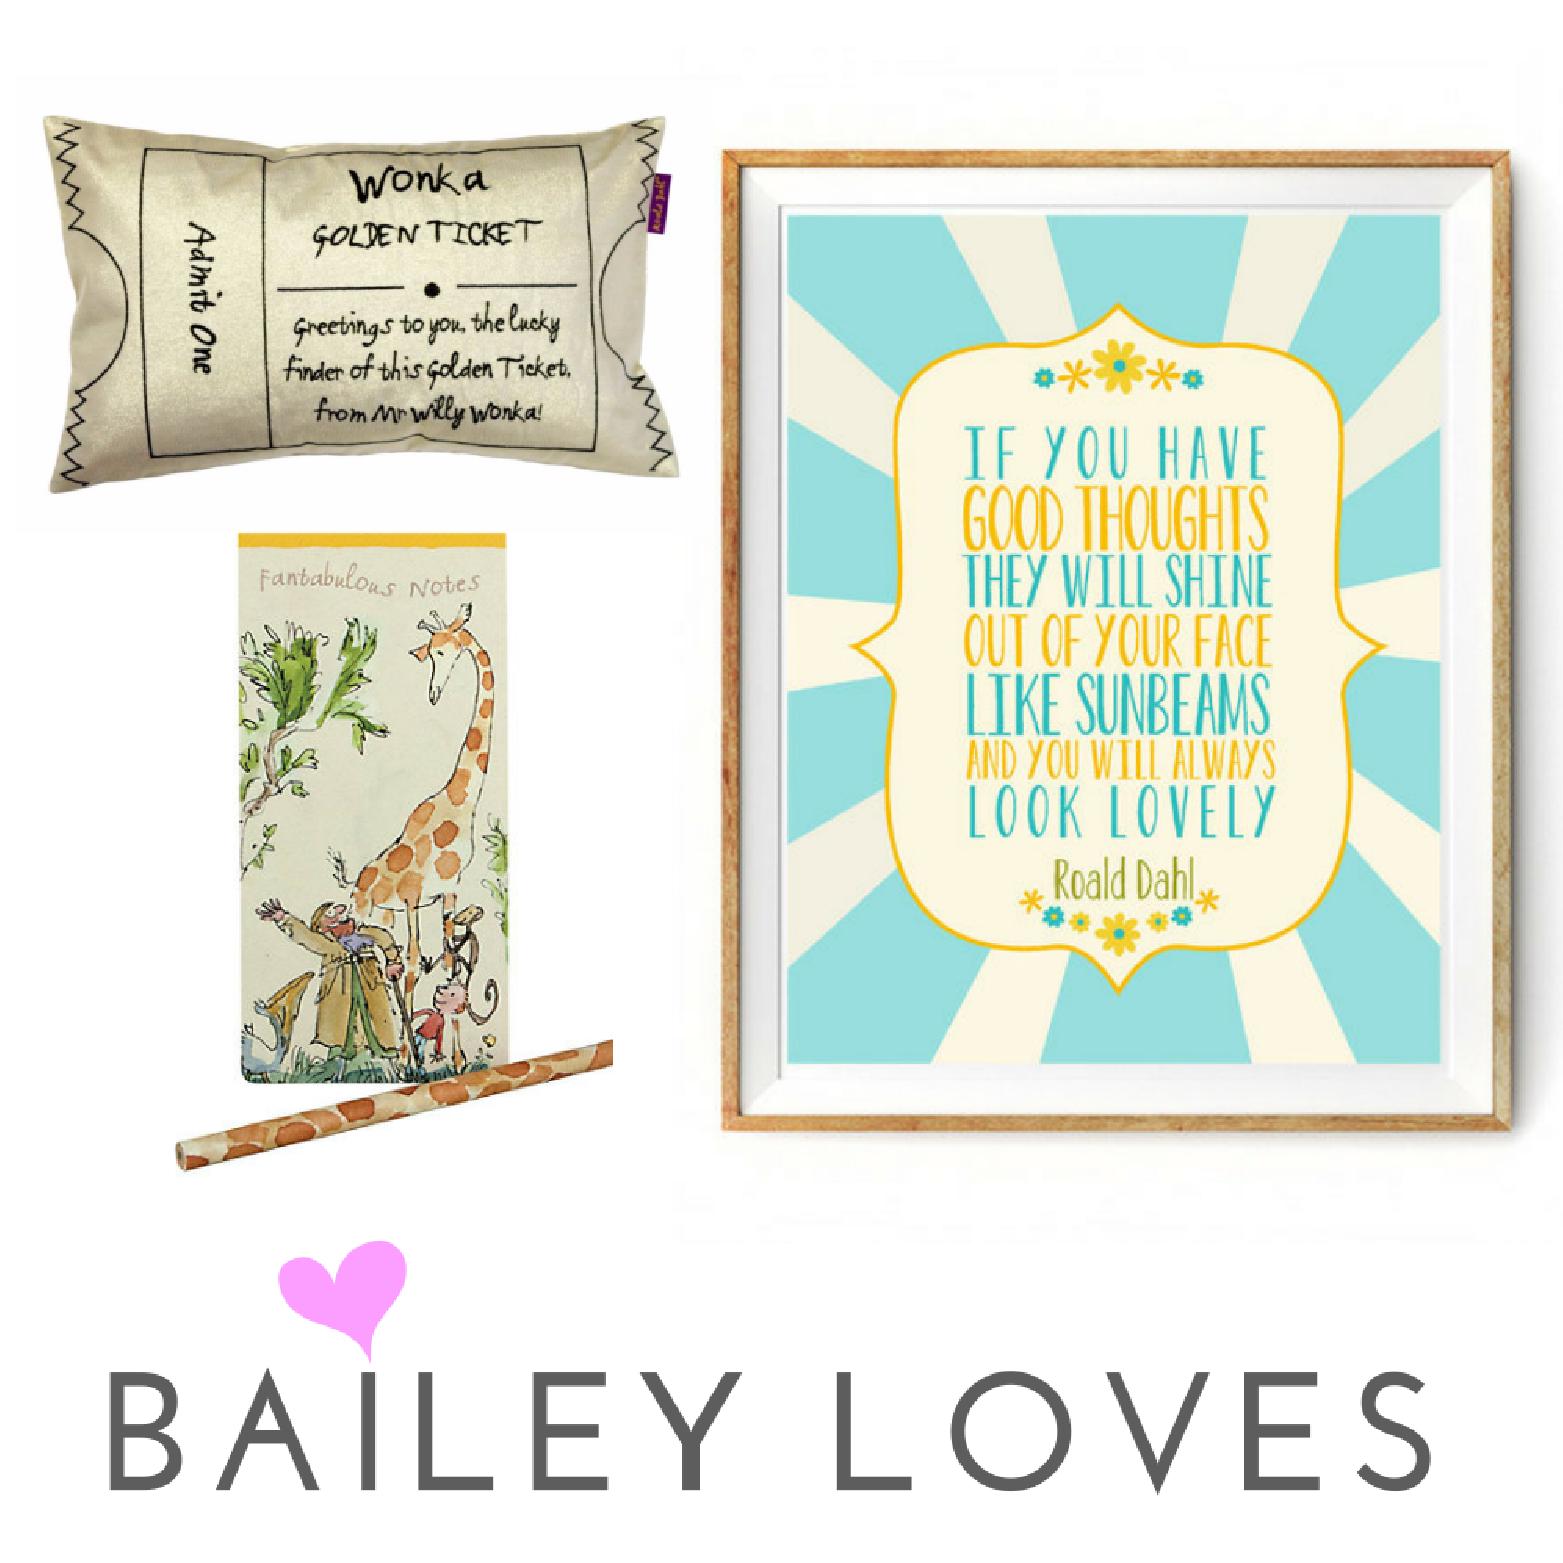 bailey-loves-roald-dahl.png